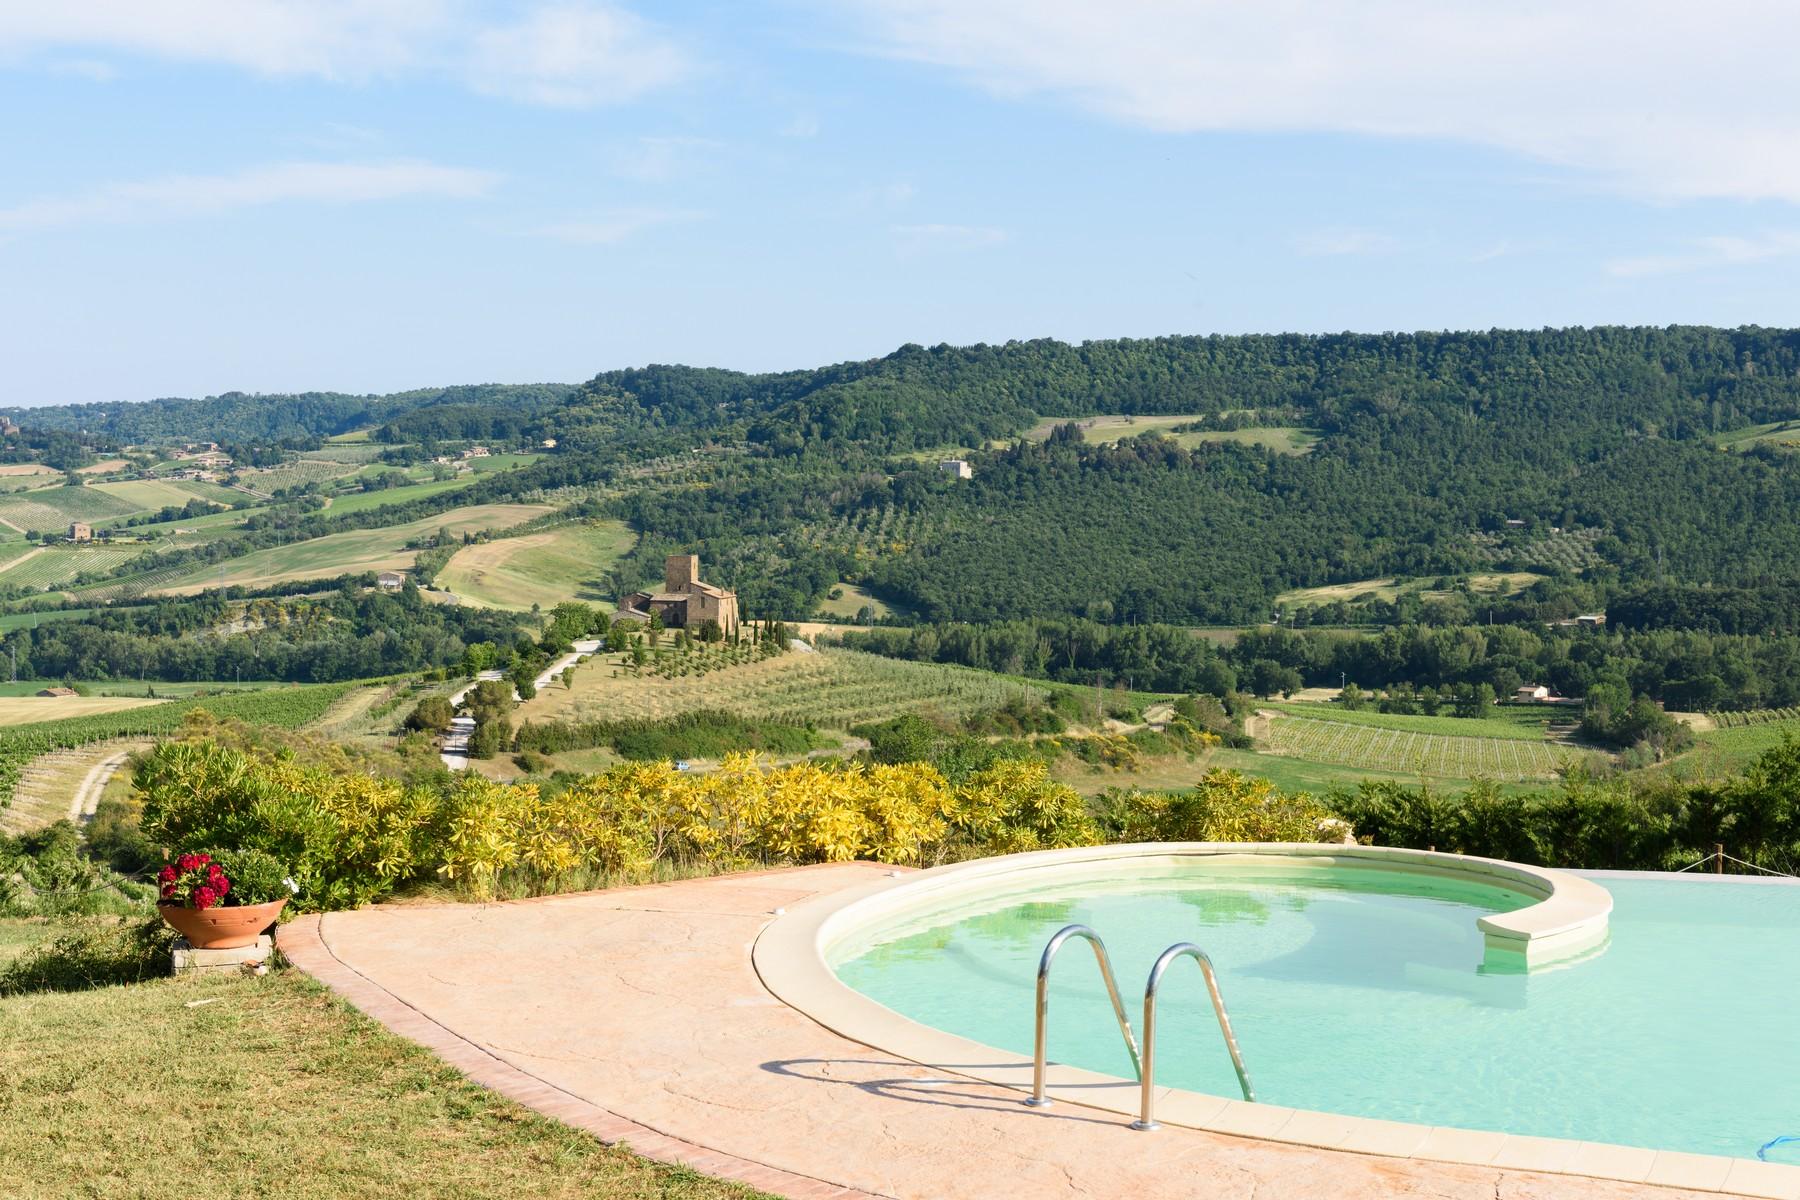 Casa indipendente in Vendita a Castel Viscardo: 5 locali, 700 mq - Foto 2